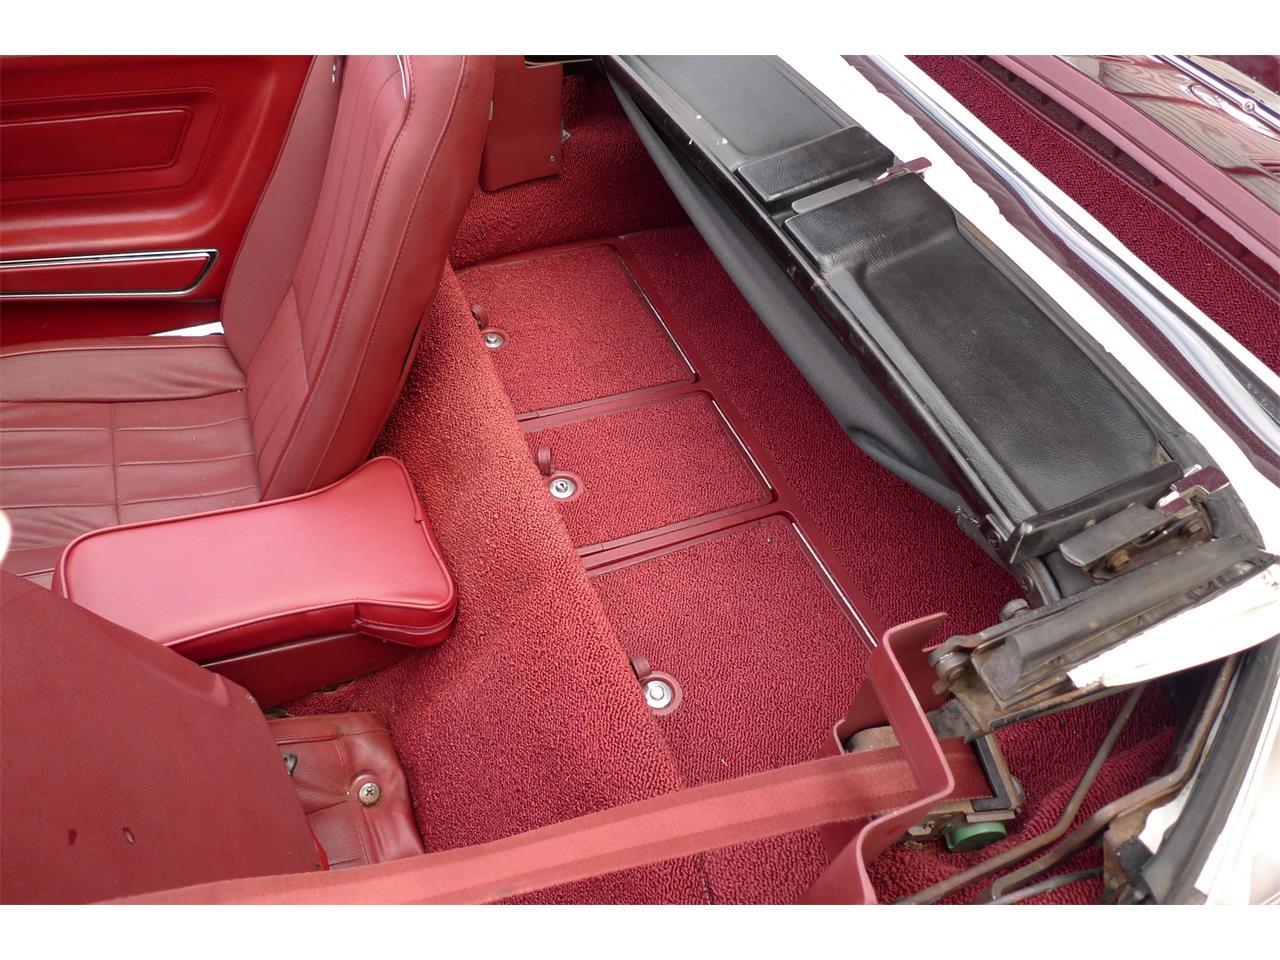 Large Picture of '75 Corvette located in Anaheim California - $20,975.00 - L2GP